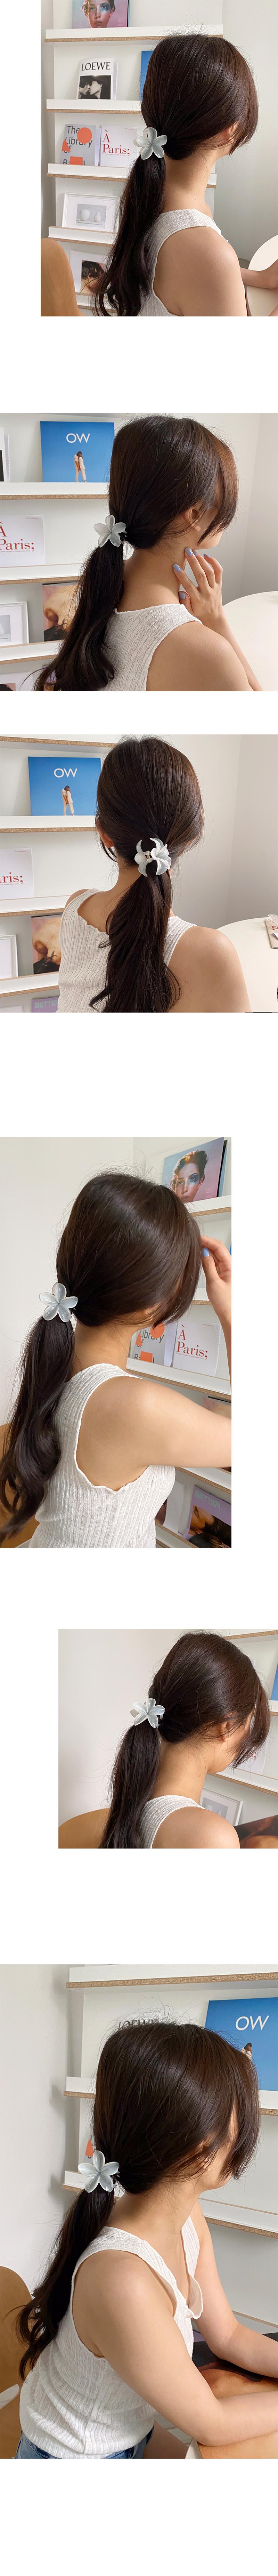 hair pin 1+1 event